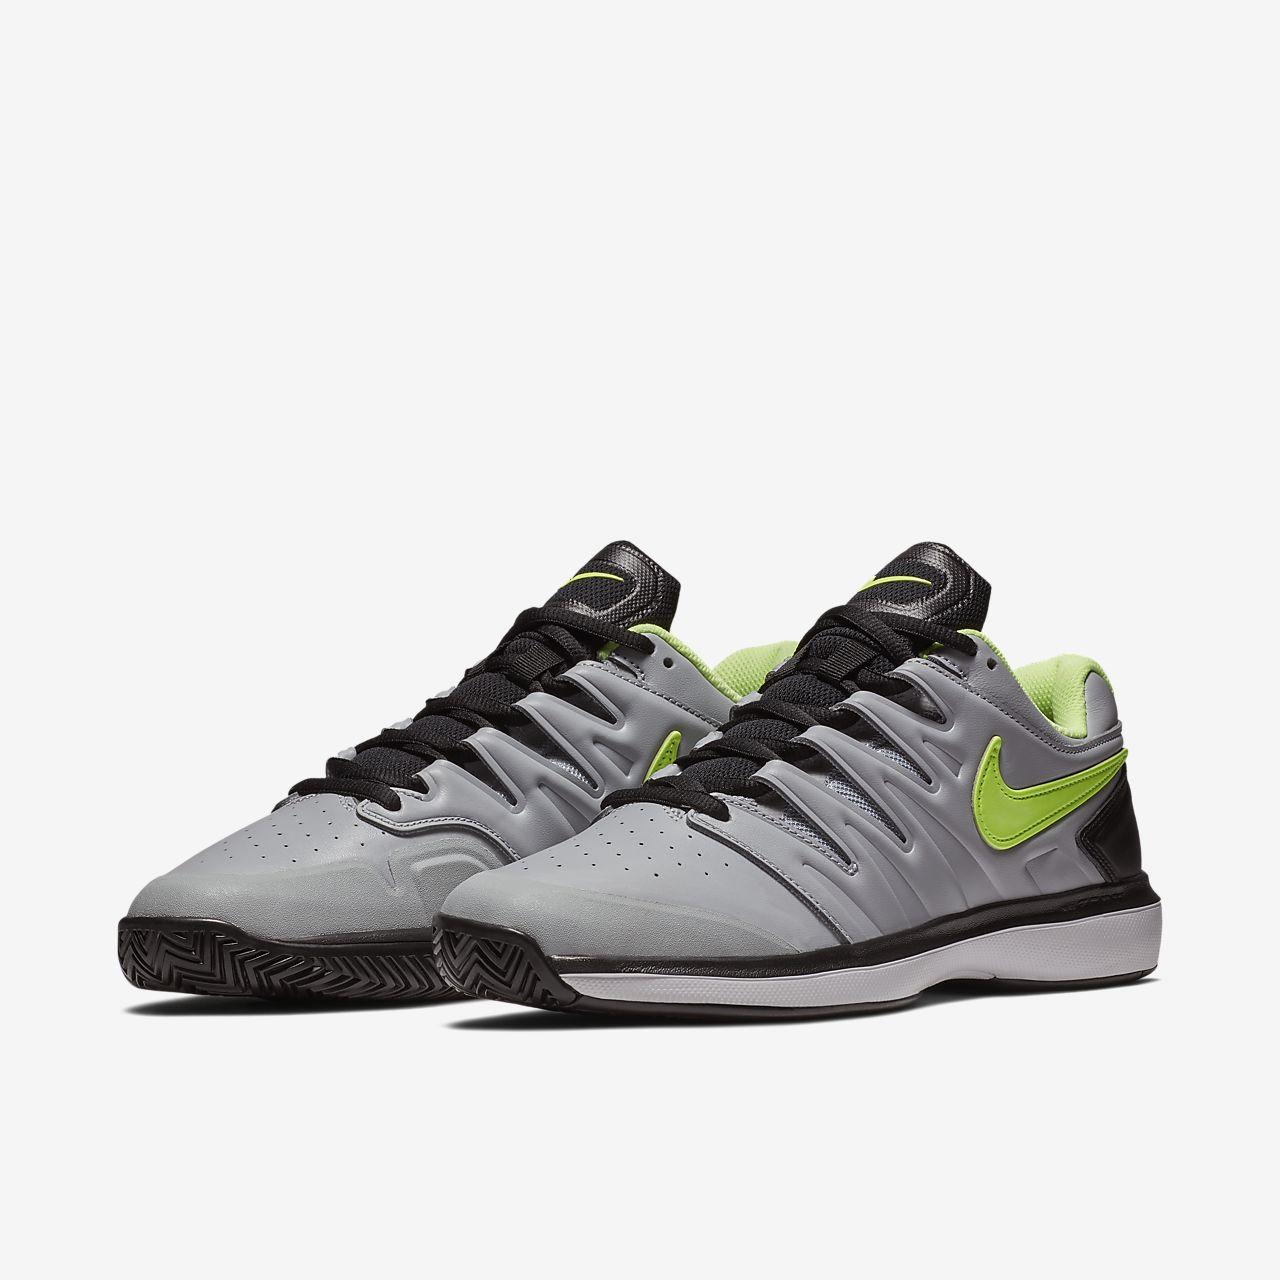 Air zoom prestige Nike 6ojnVx